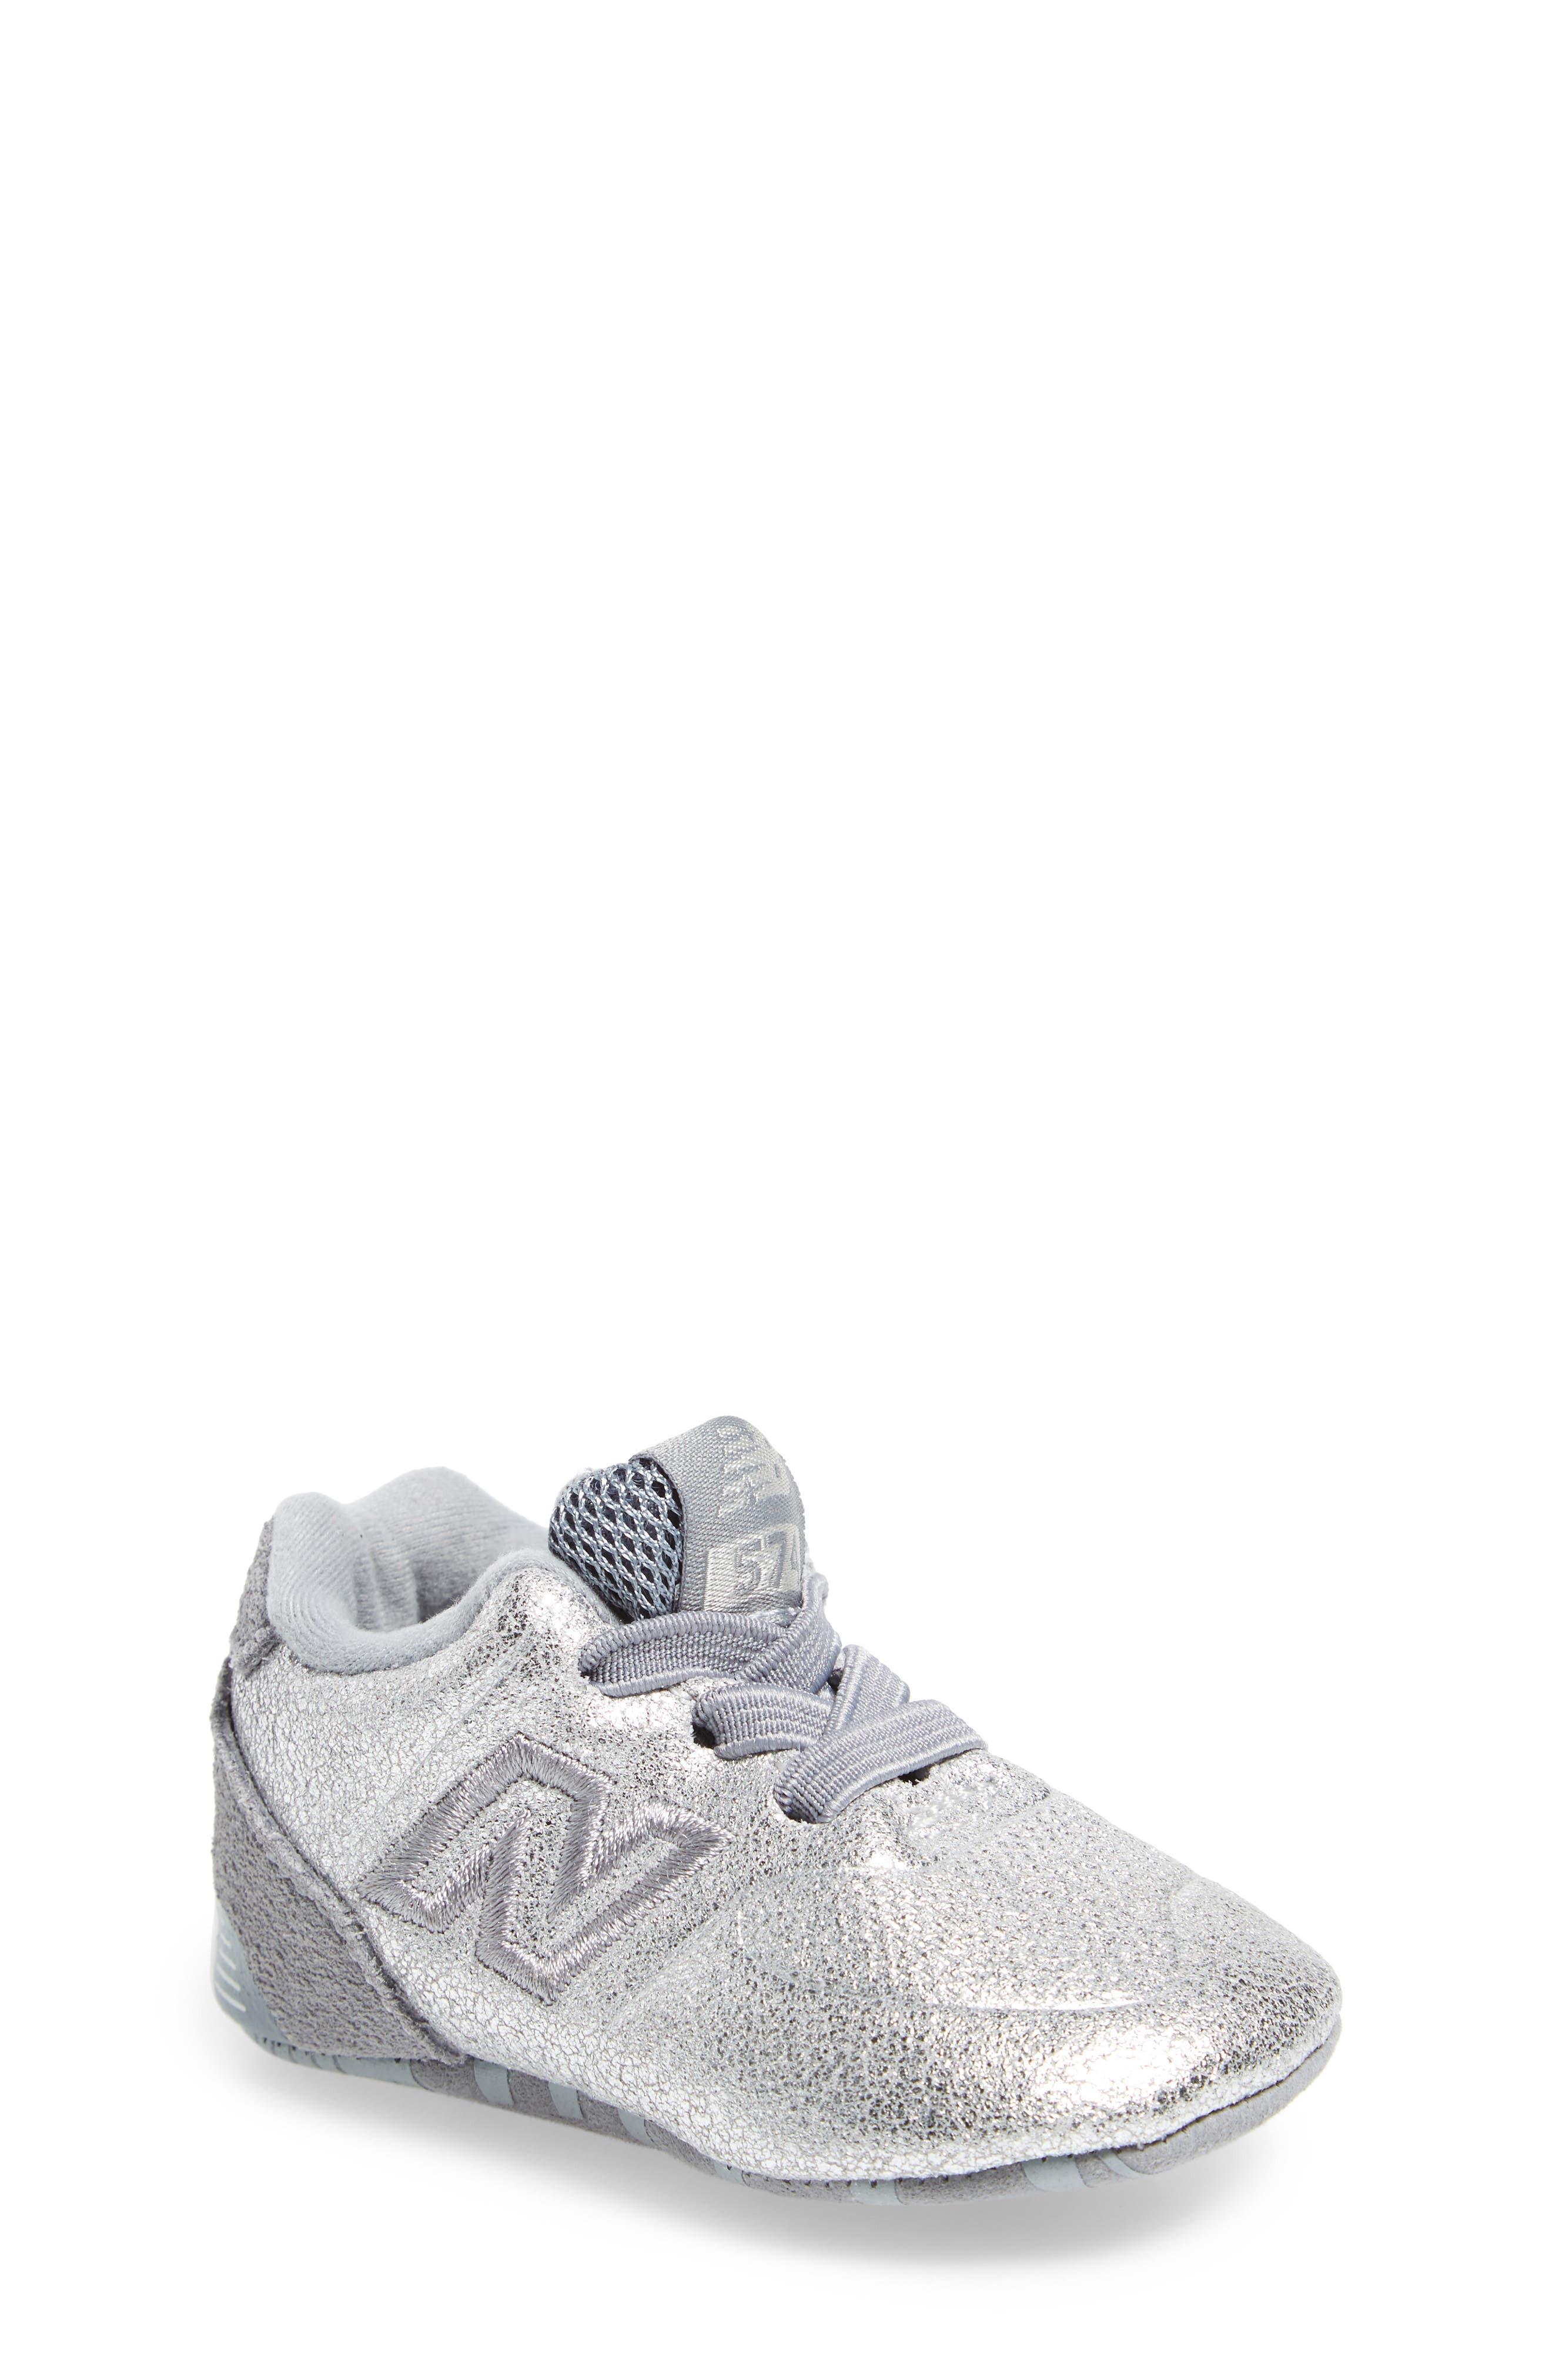 574 Metallic Crib Sneaker,                             Main thumbnail 1, color,